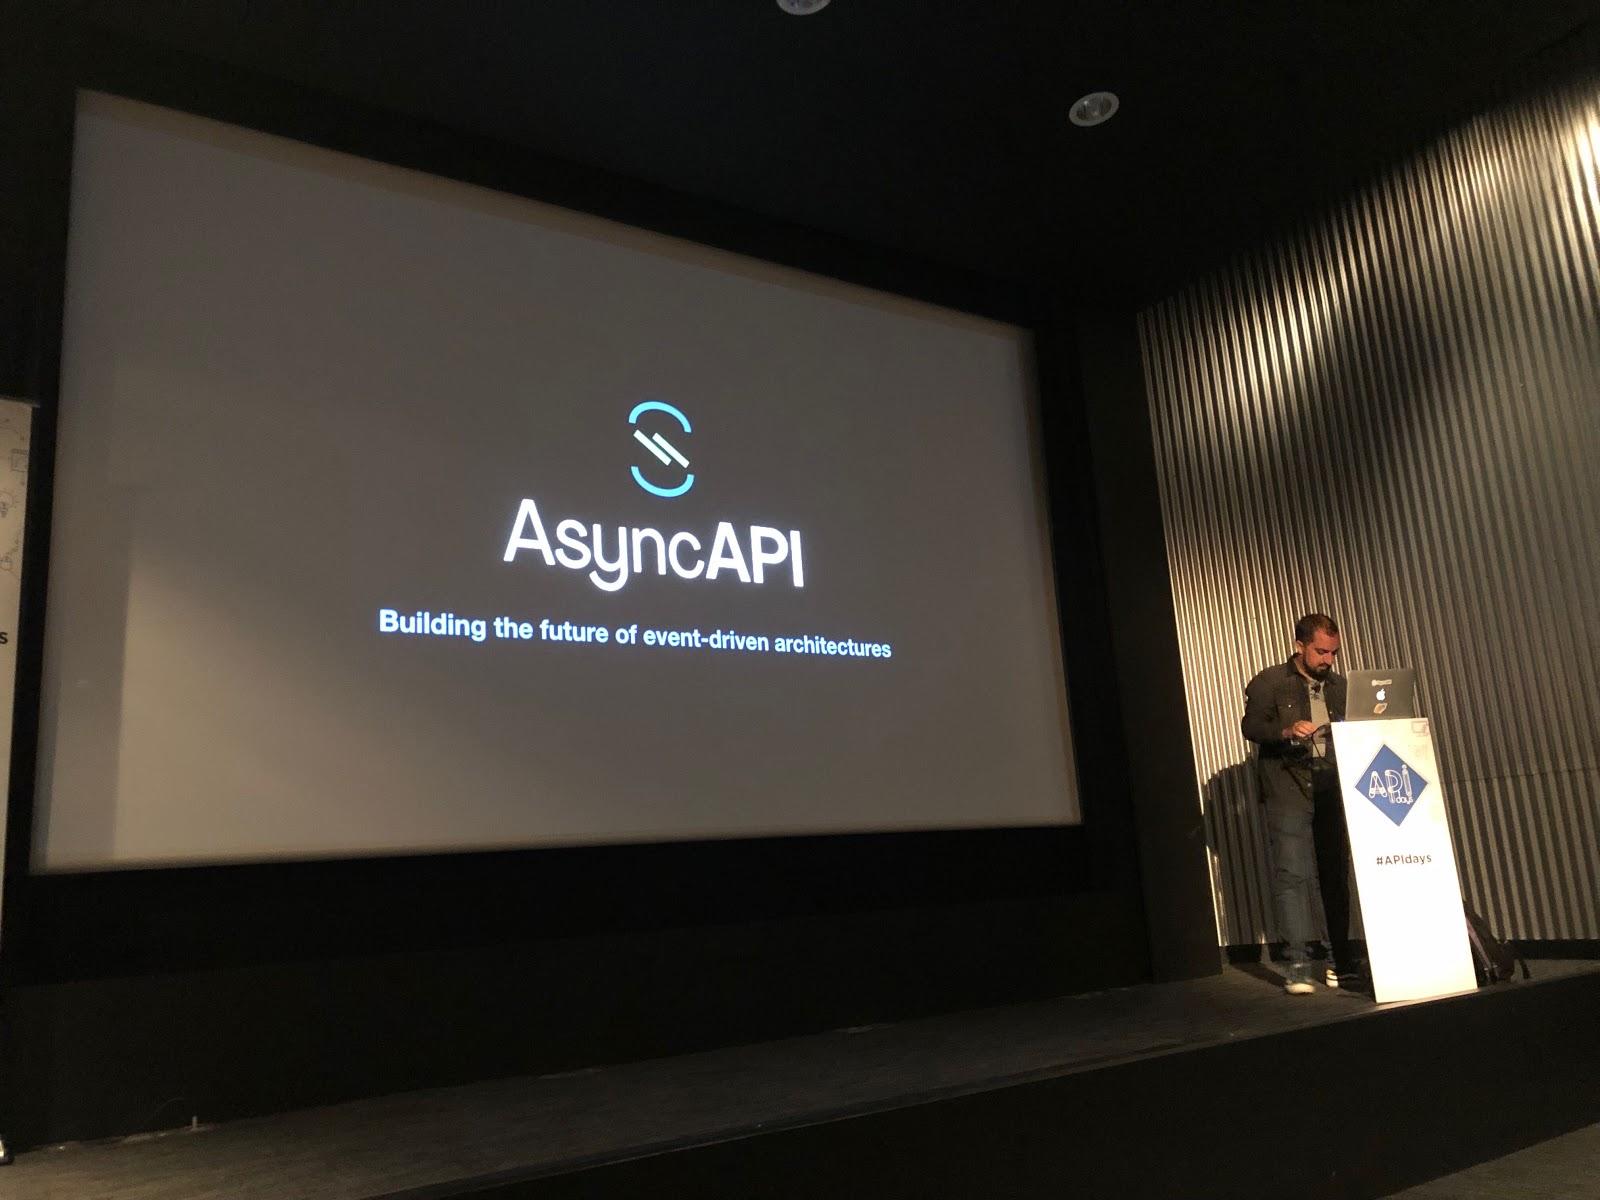 AsyncAPI founder Fran Mendez speaks at APIdays in San Francisco TIBCO Project Flogo